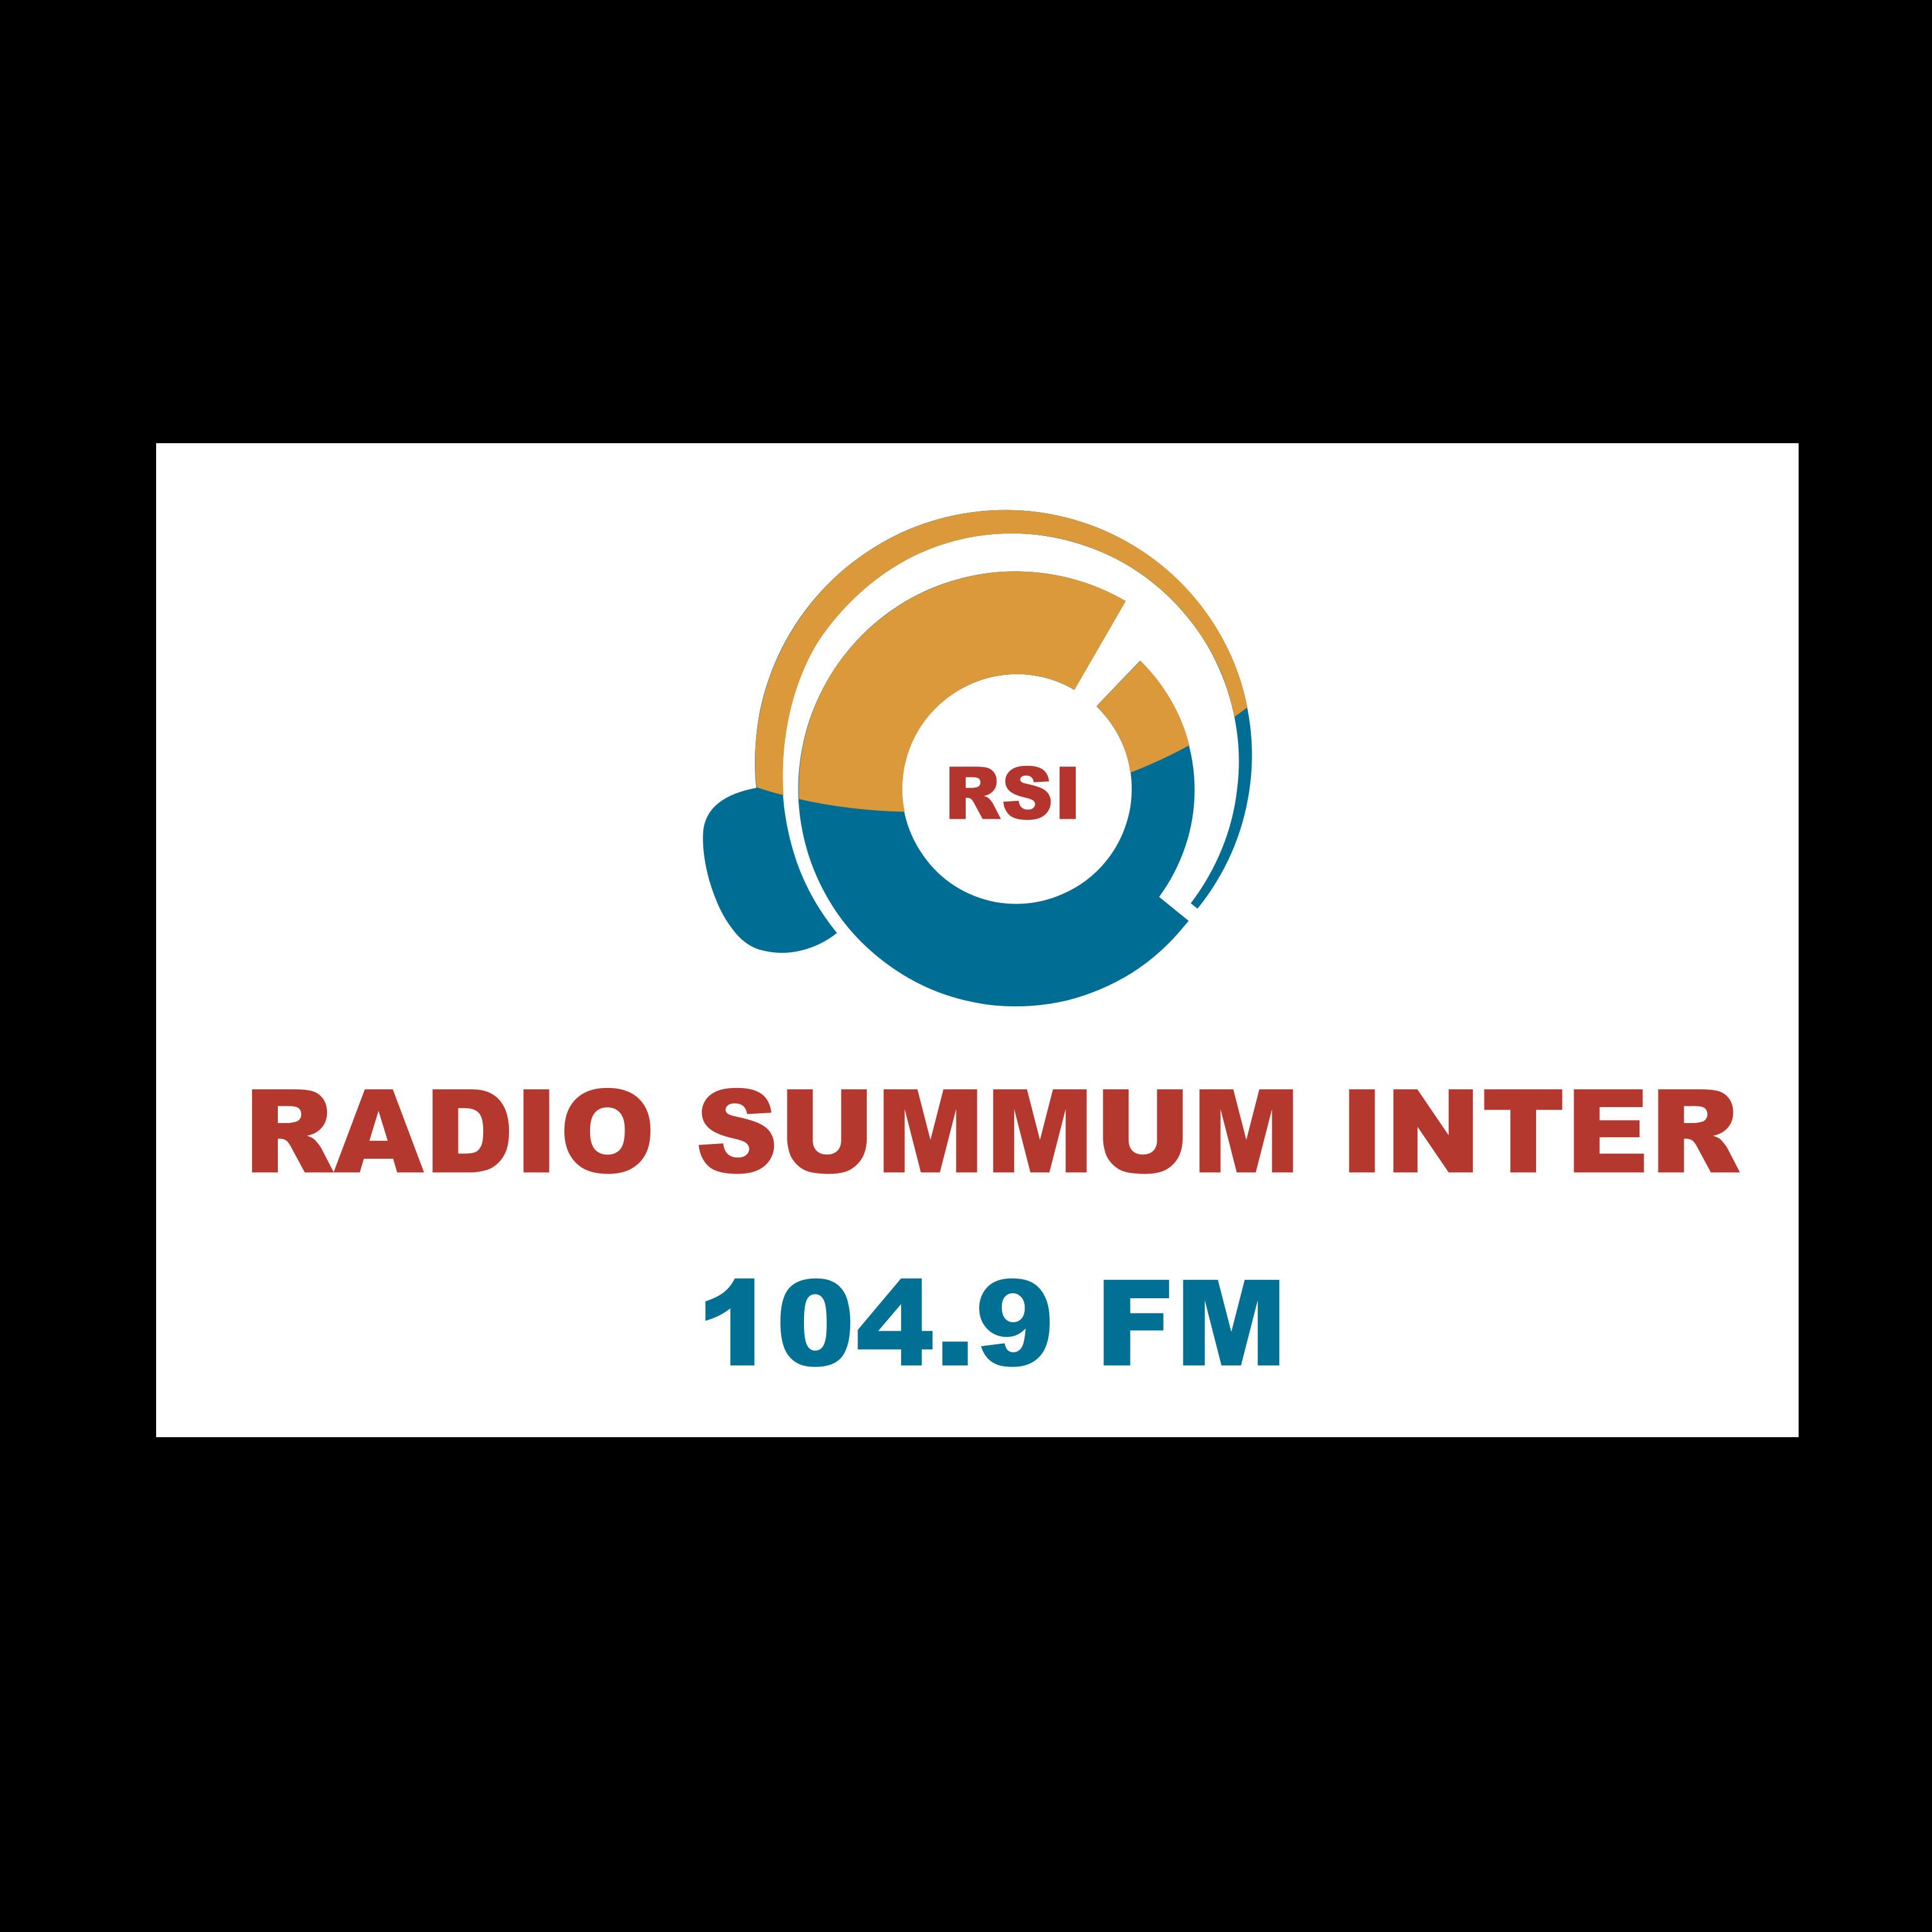 RADIO SUMMUM INTER